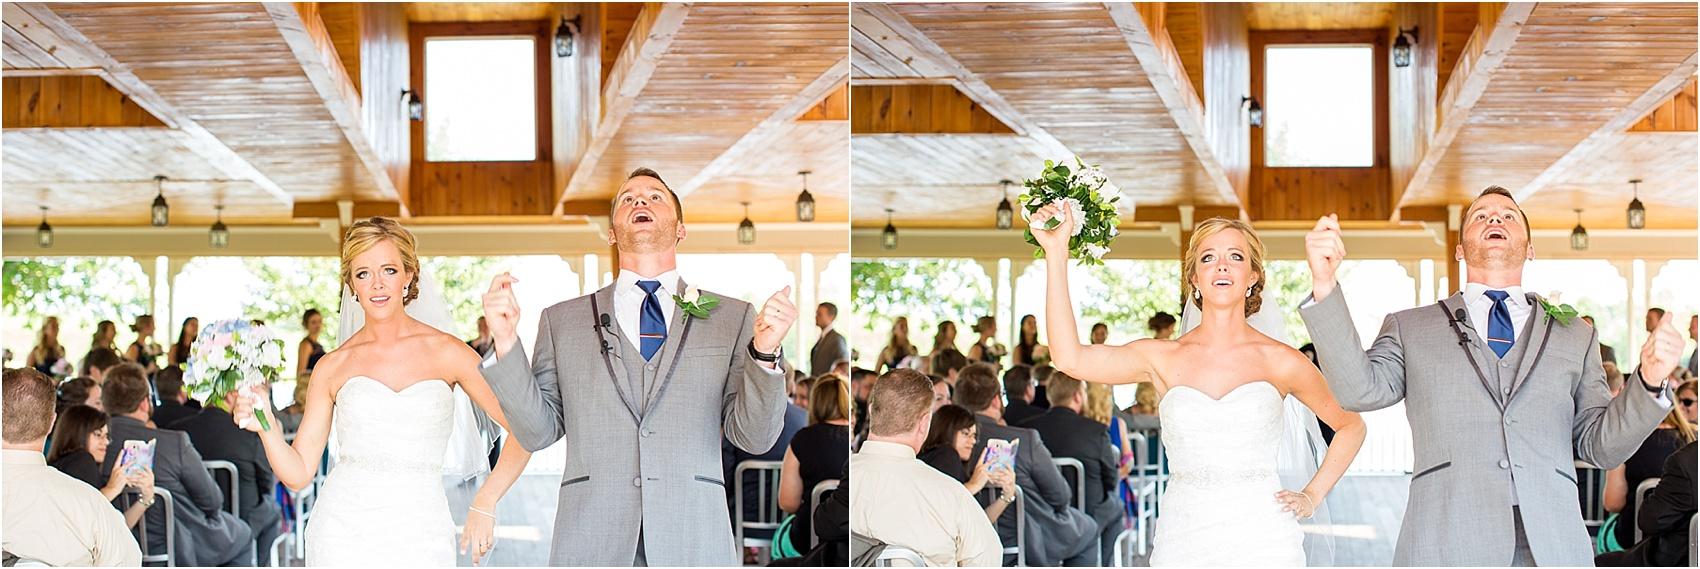 Brock Wedding Highlights- Frogtown-56_WEB.jpg